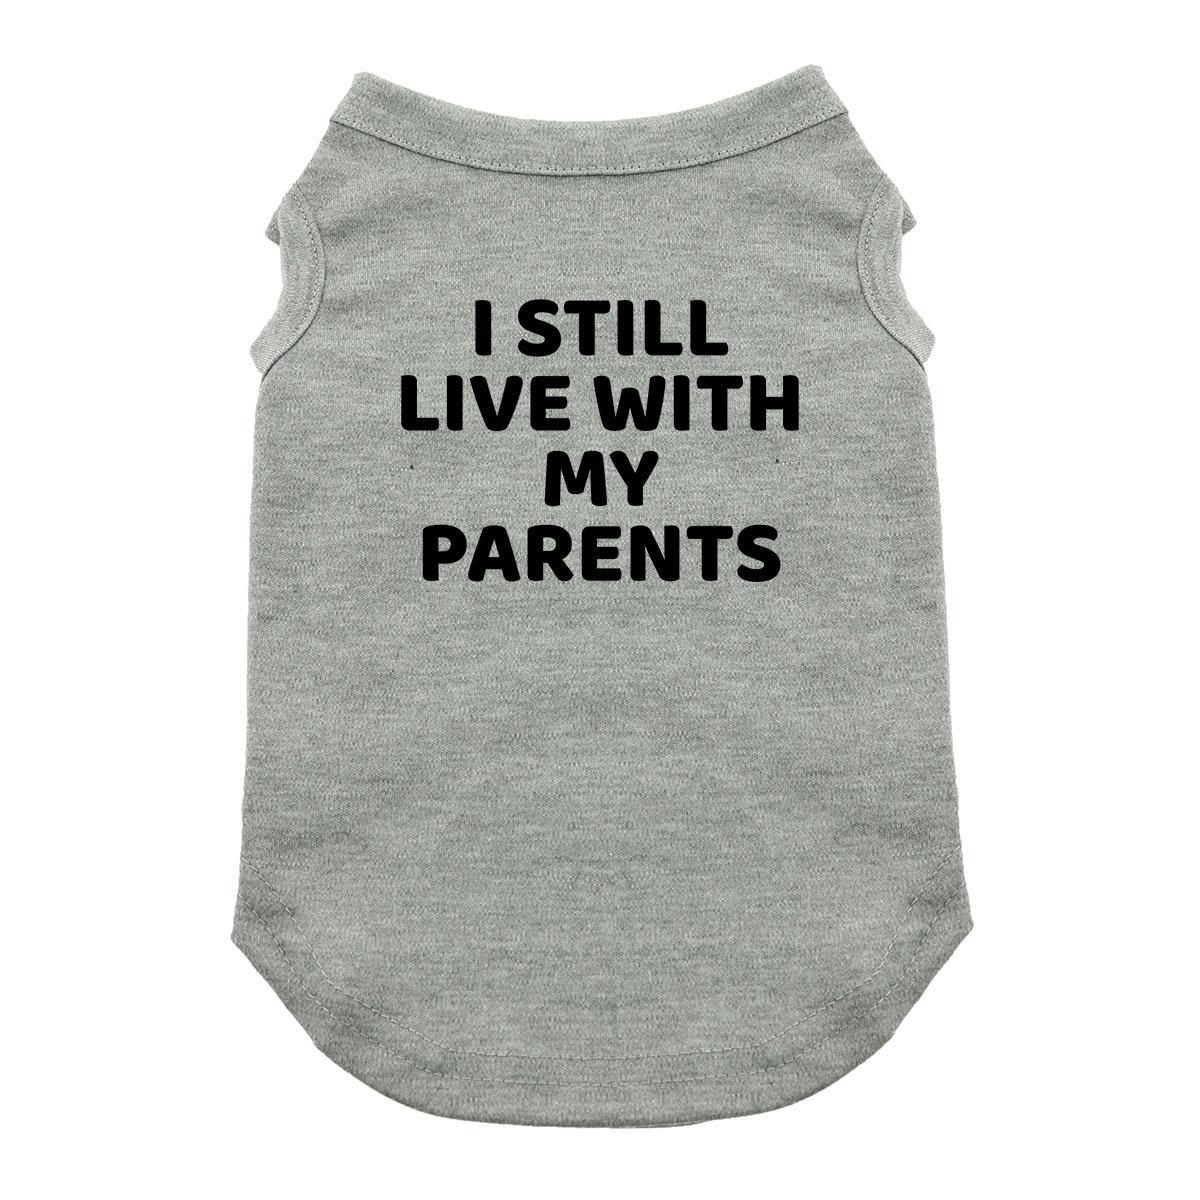 I Still Live With My Parents Dog Shirt - Gray